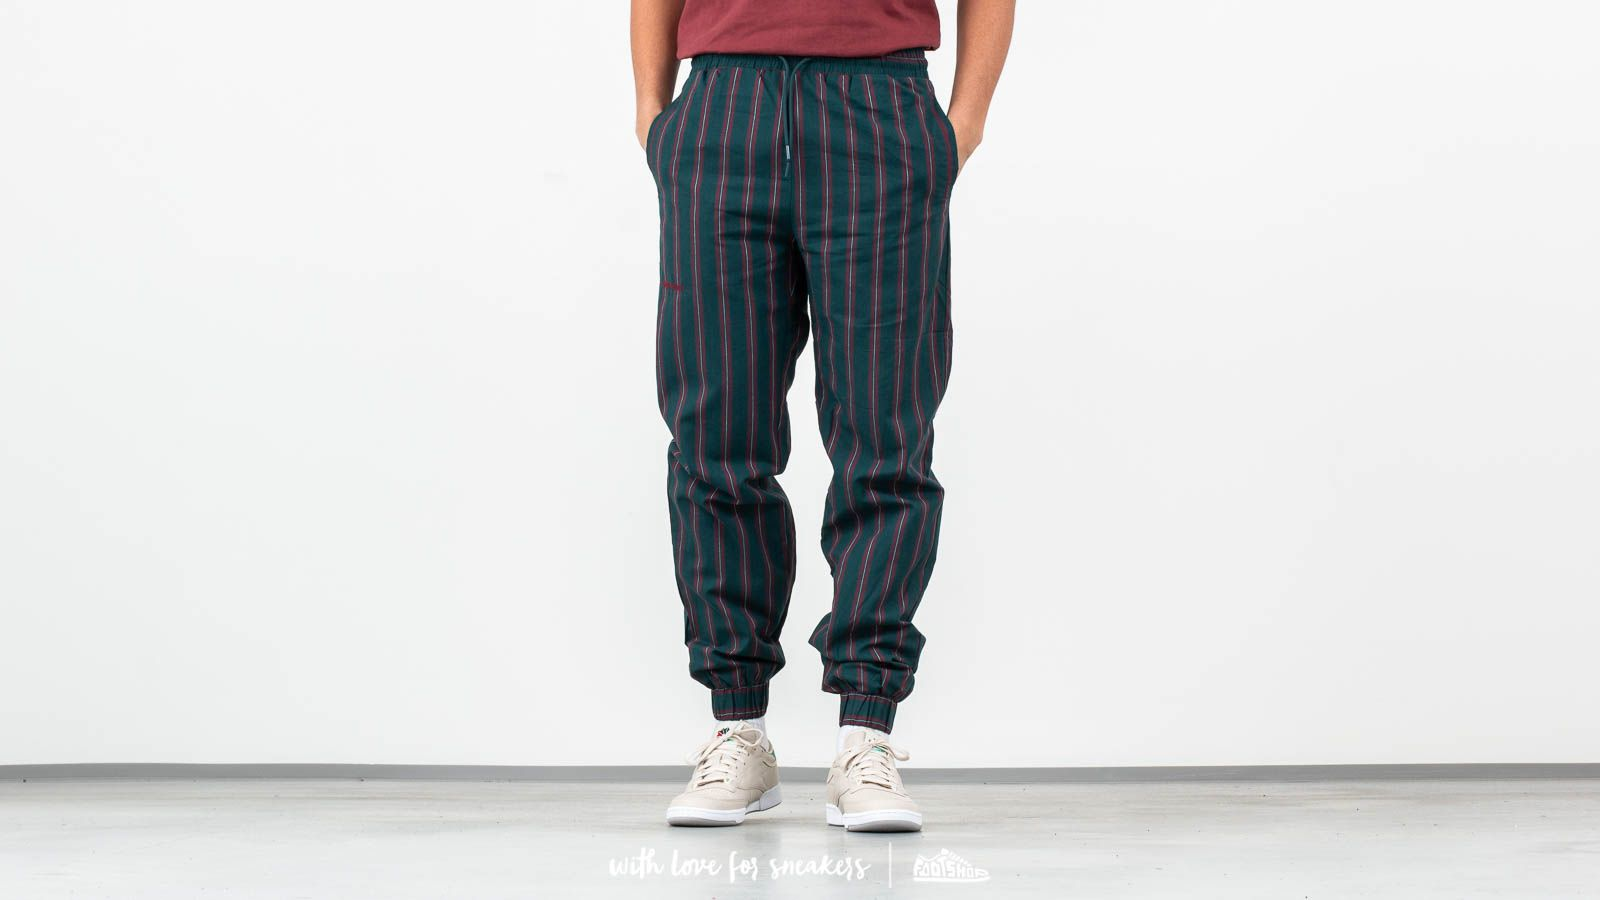 Han Kjøbenhavn Track Pants Green Stripe za skvelú cenu 155 € kúpite na Footshop.sk